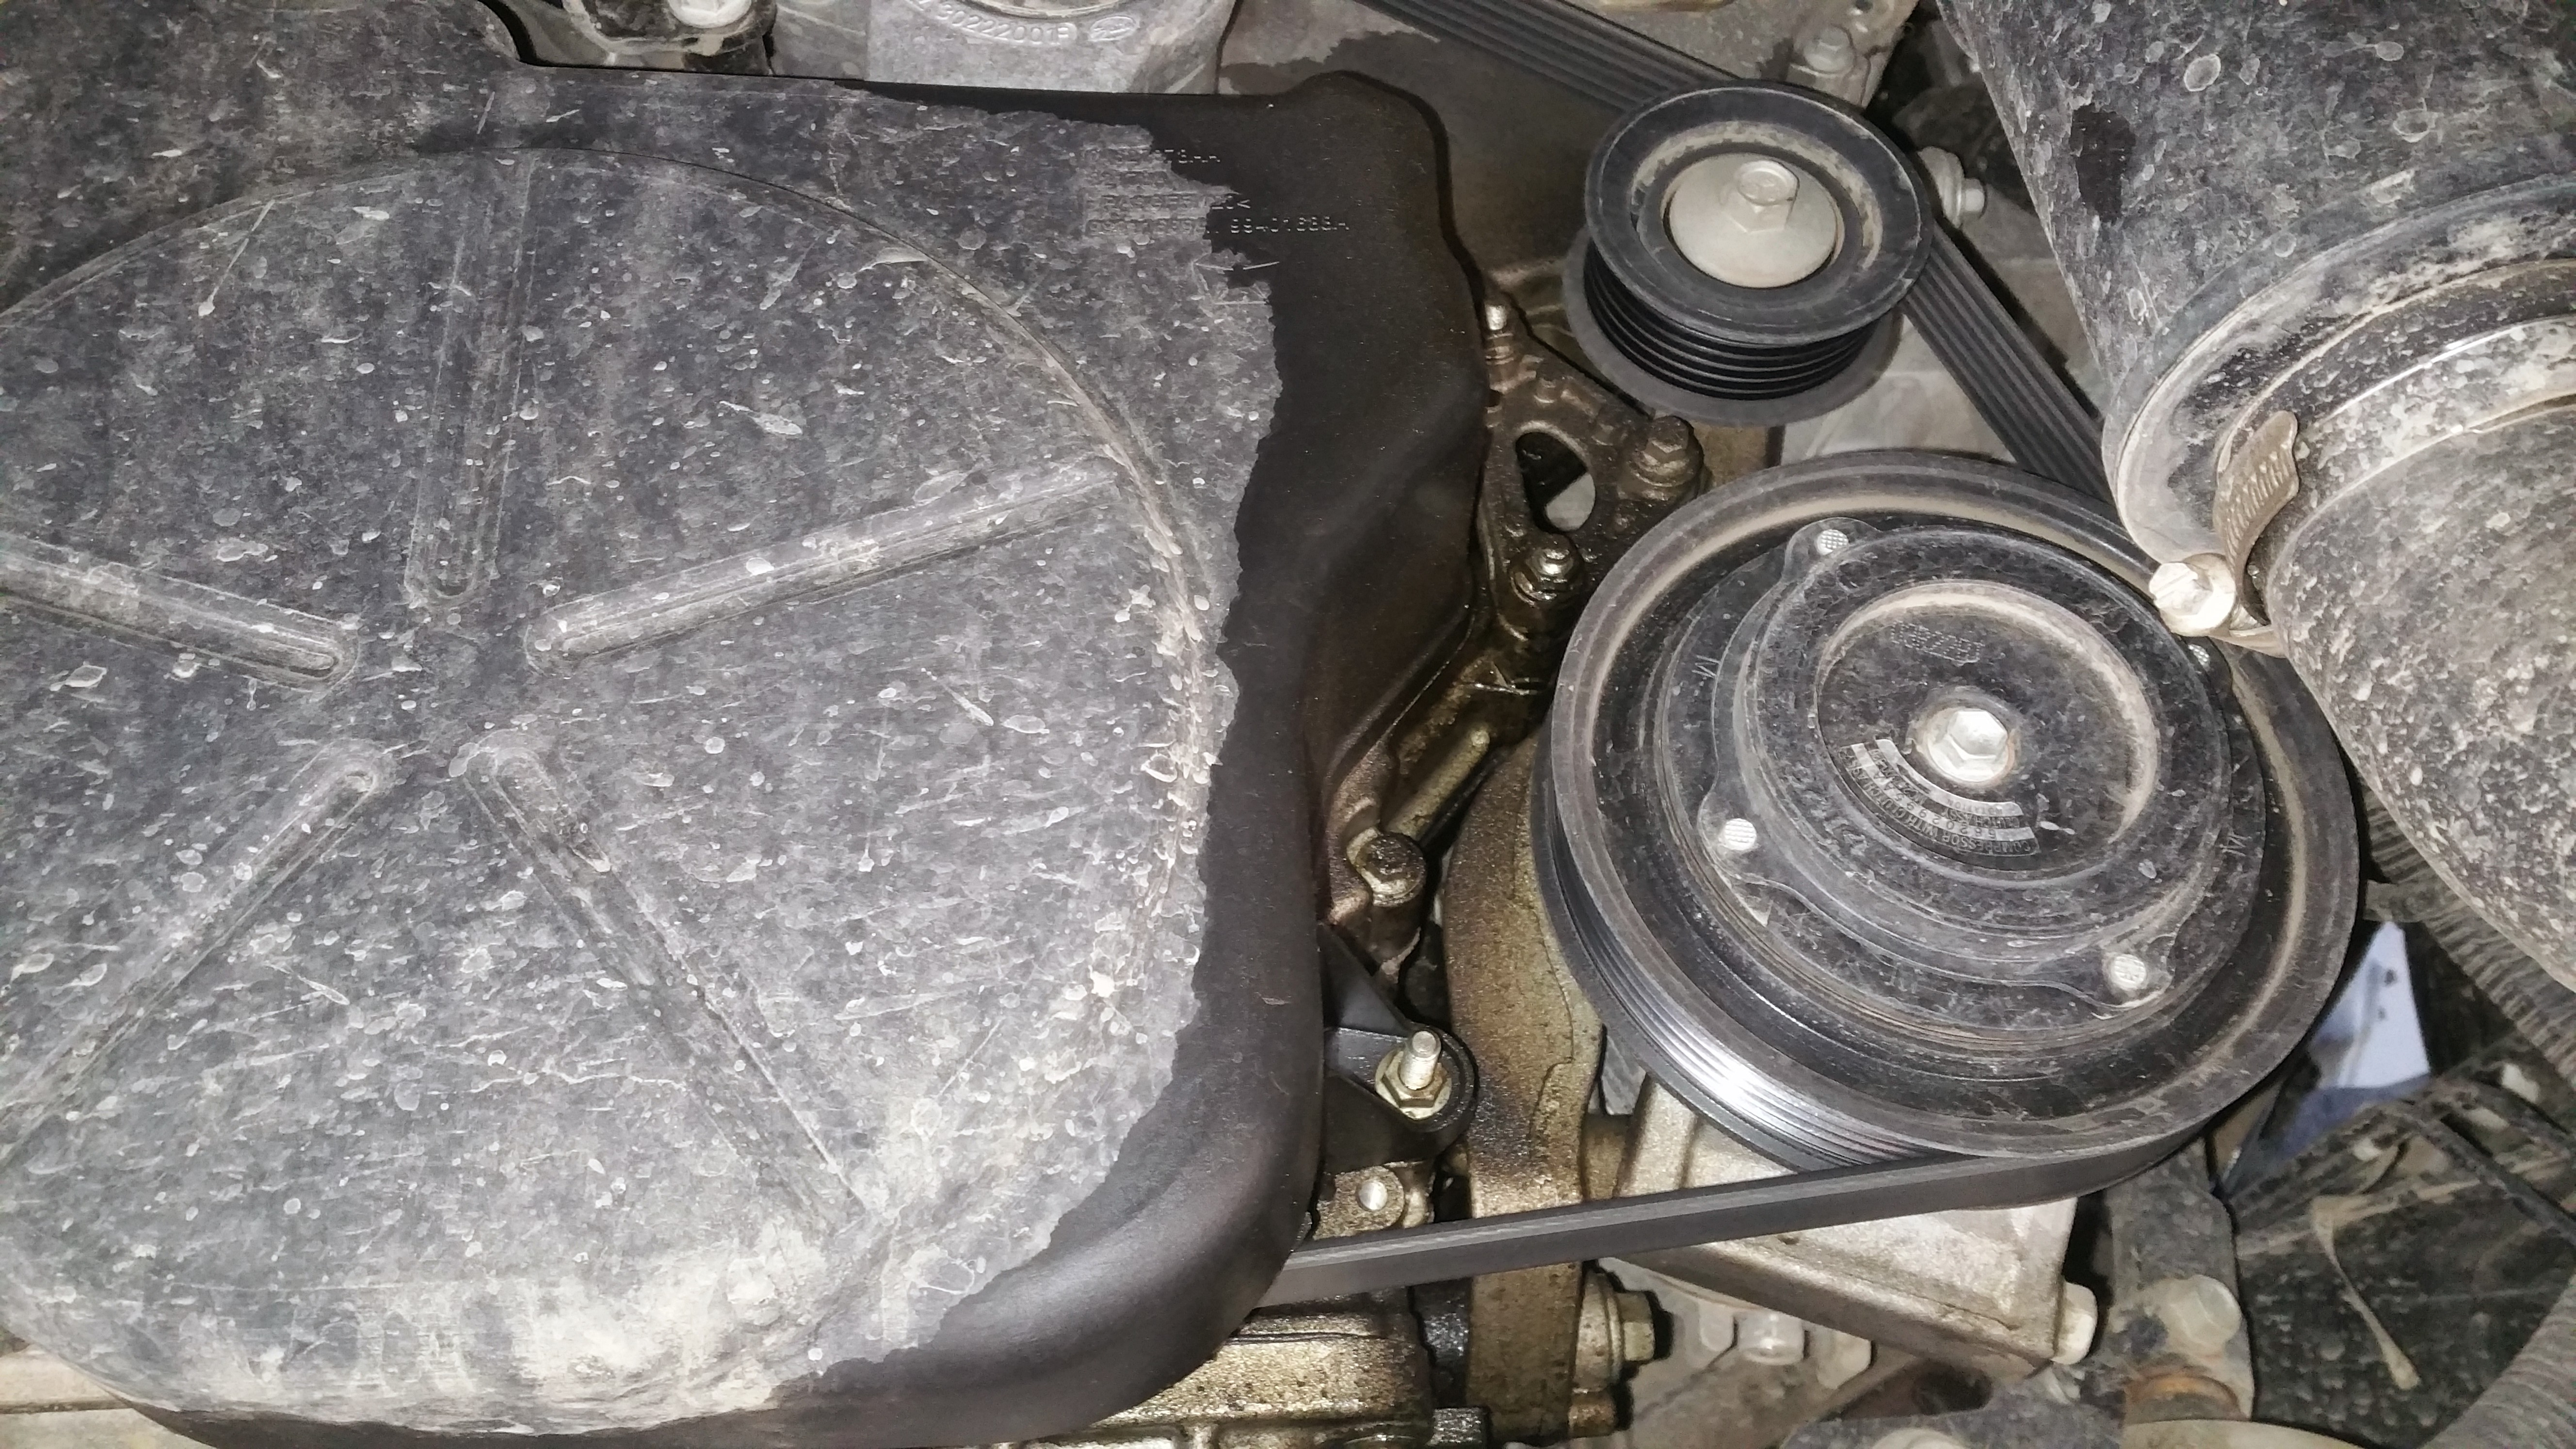 D Has Anyone Else Had Oil Leak on Dodge Ram 3500 Engine